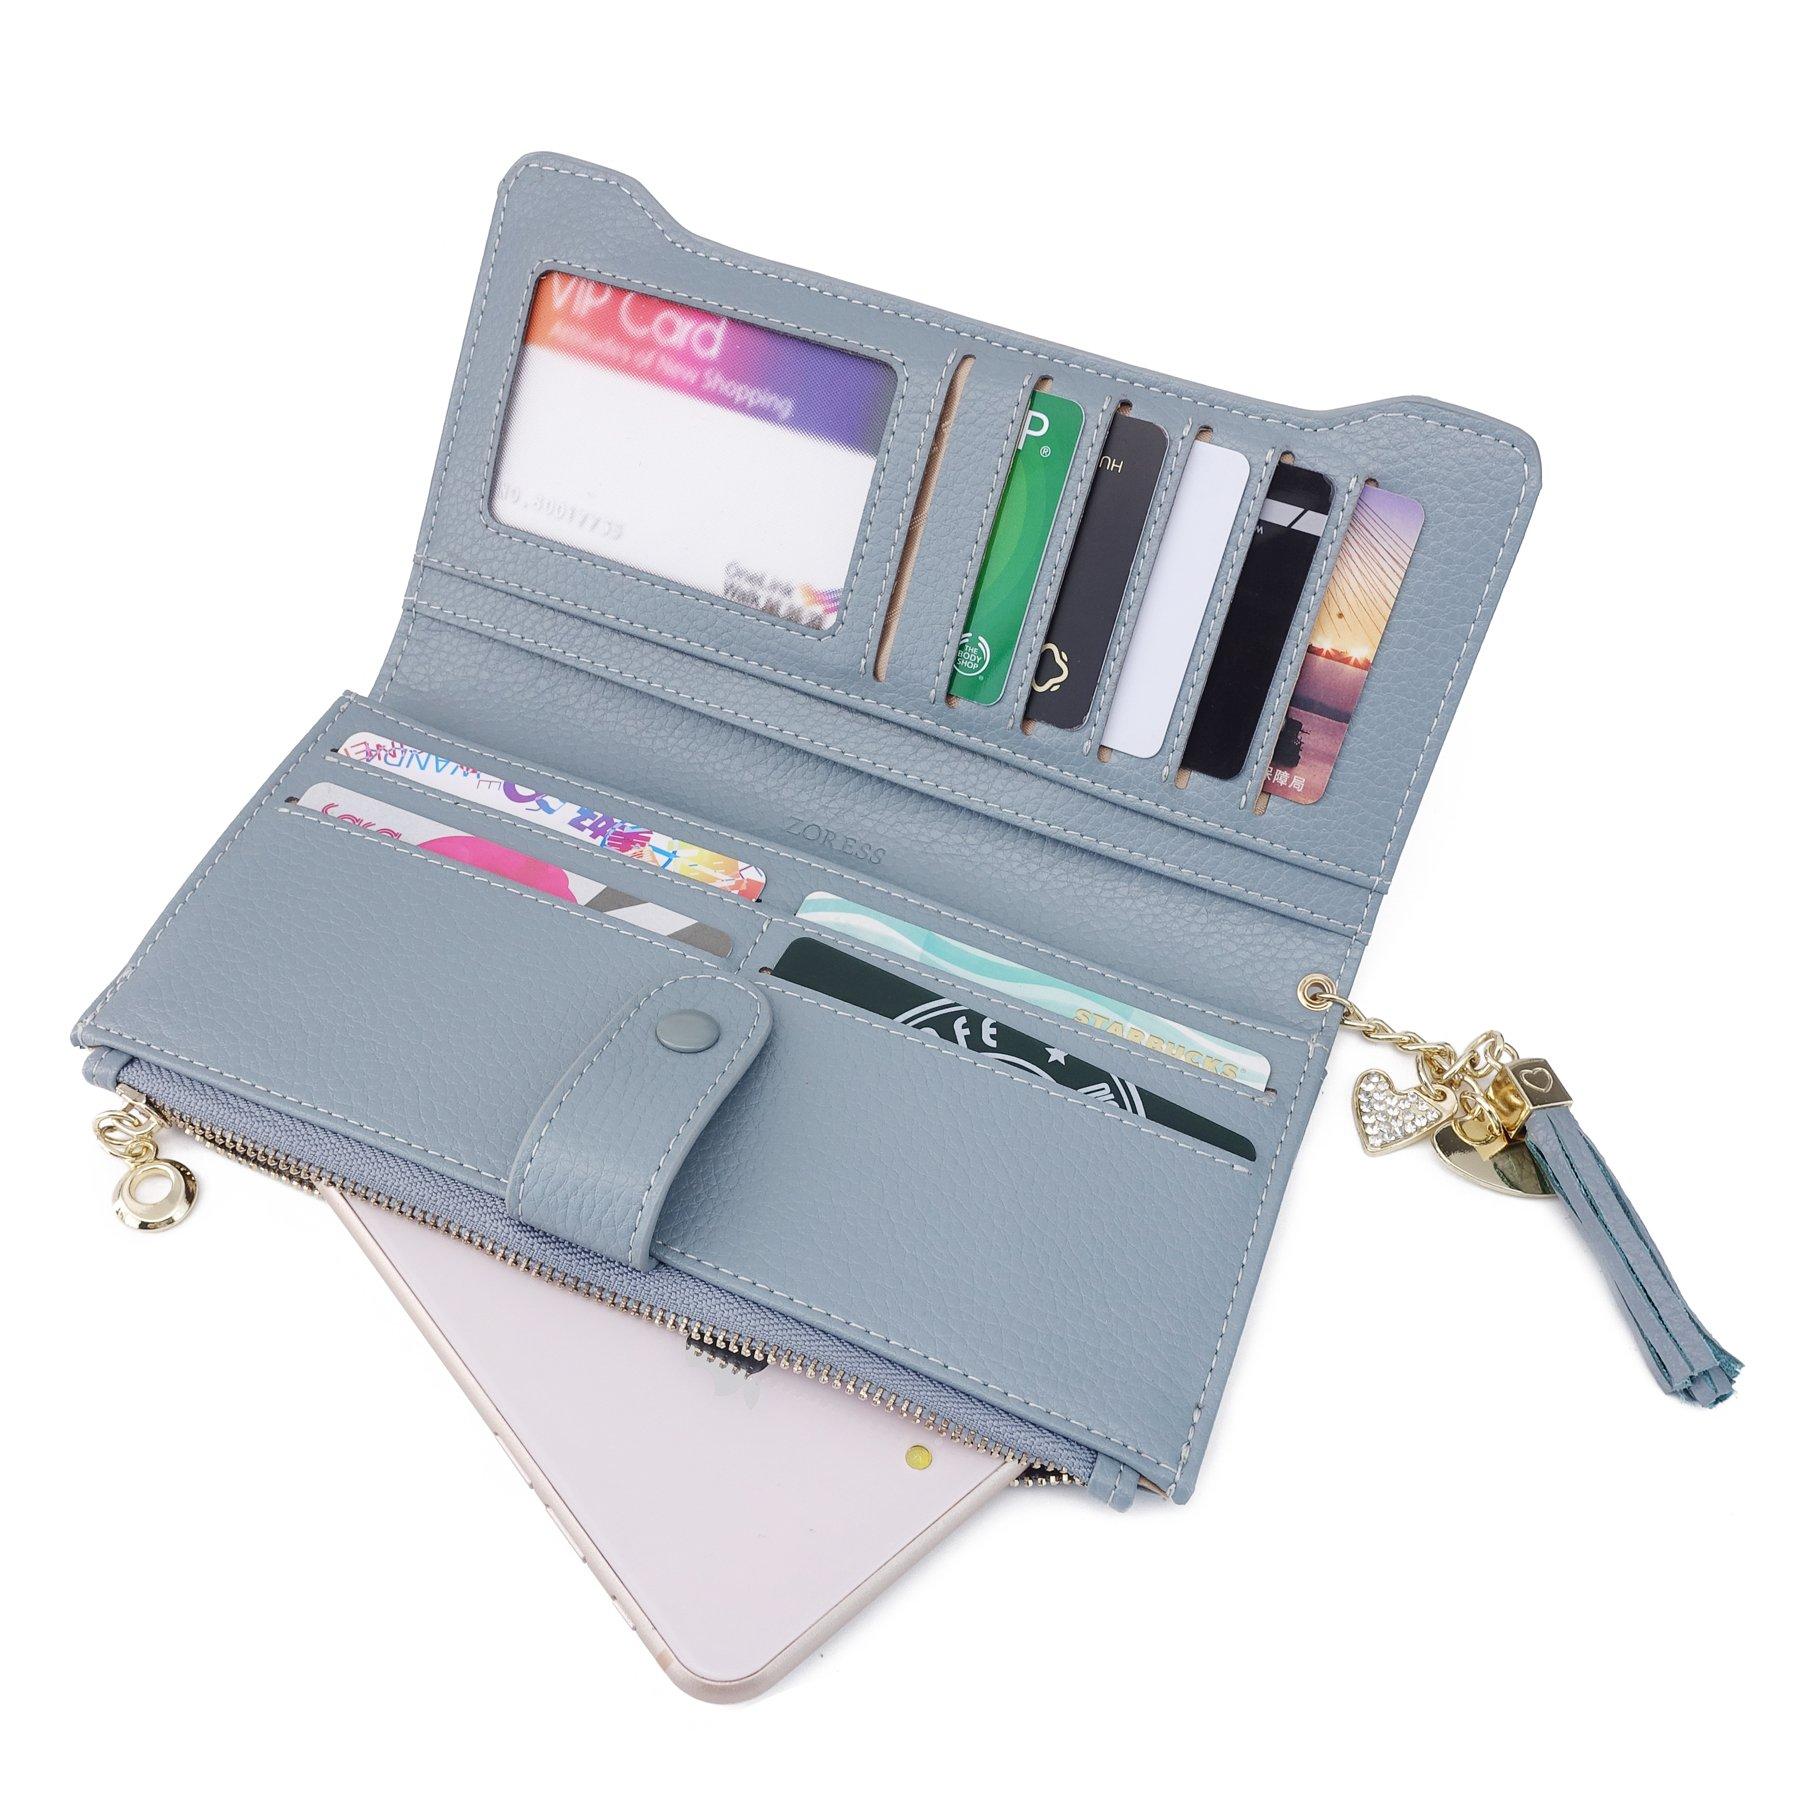 b215b034907e ZORESS Women's RFID Blocking Soft Leather Wallet Large Capacity ...